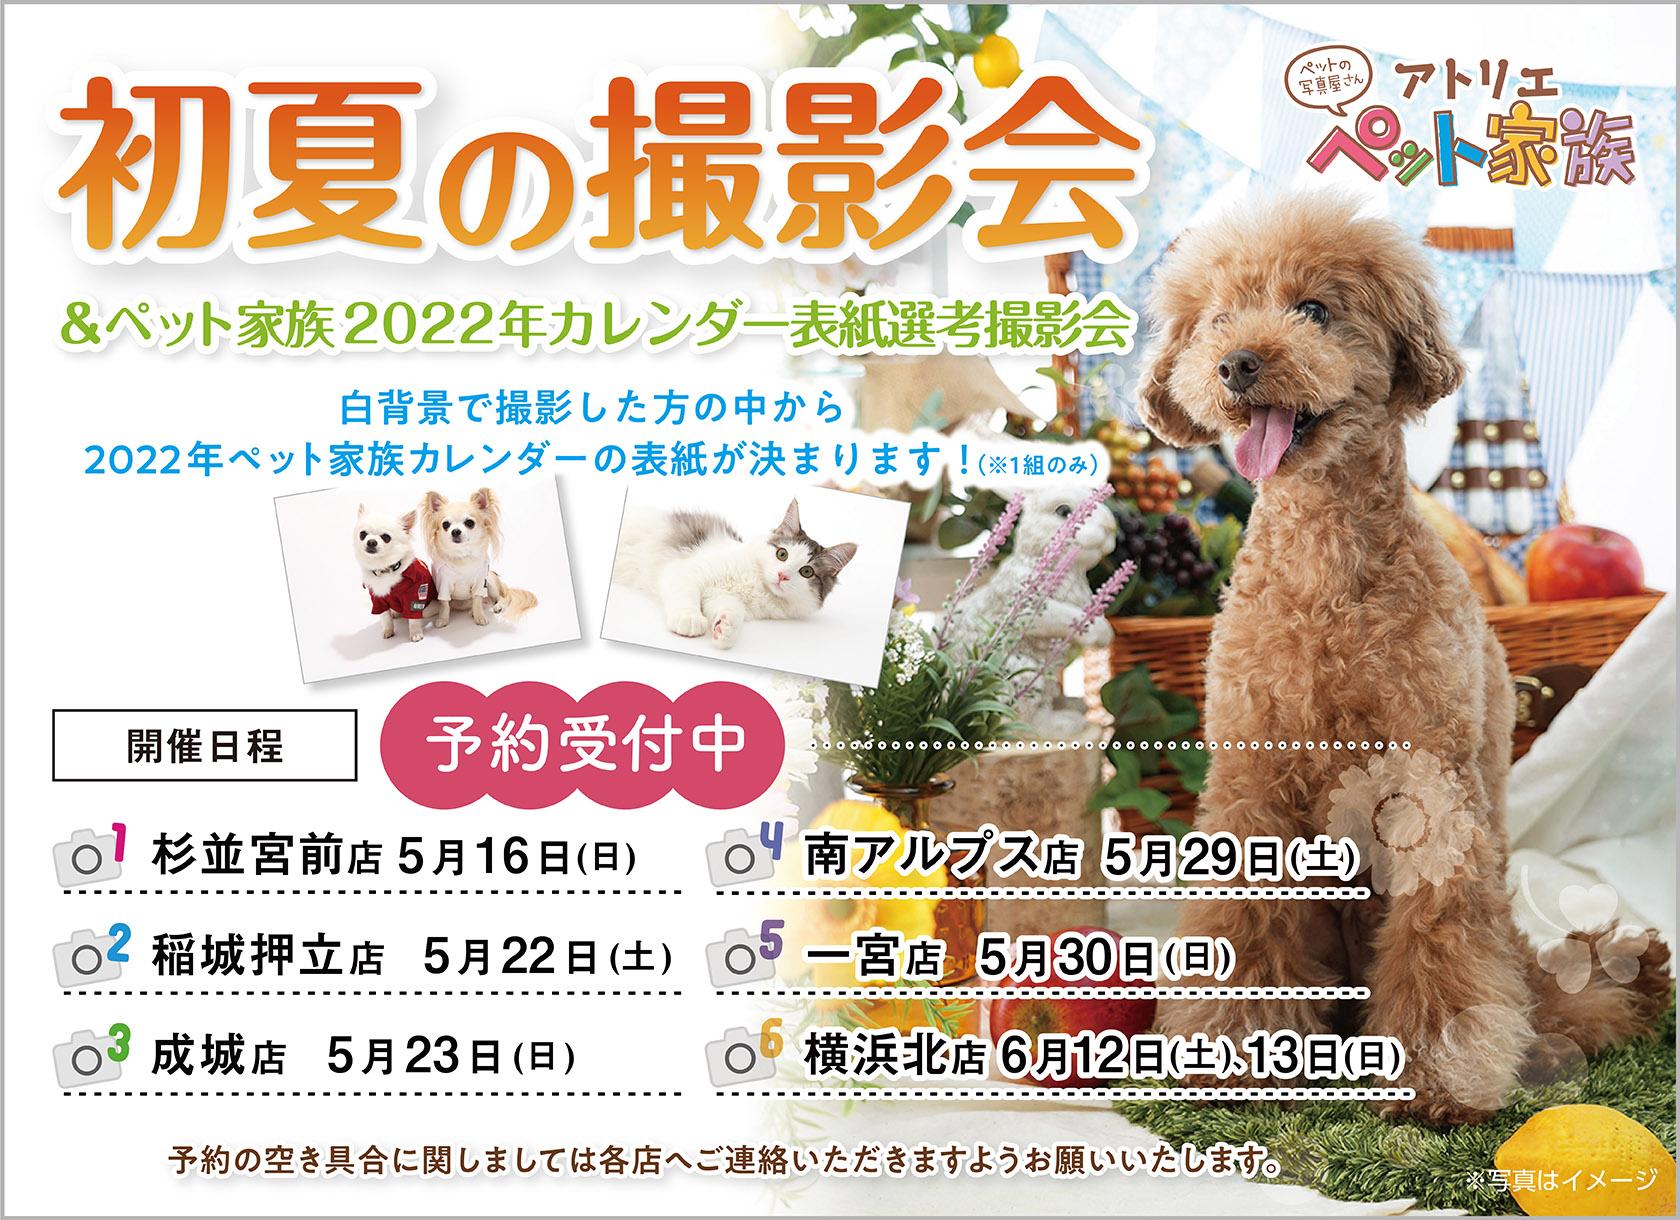 初夏の撮影会 開催!